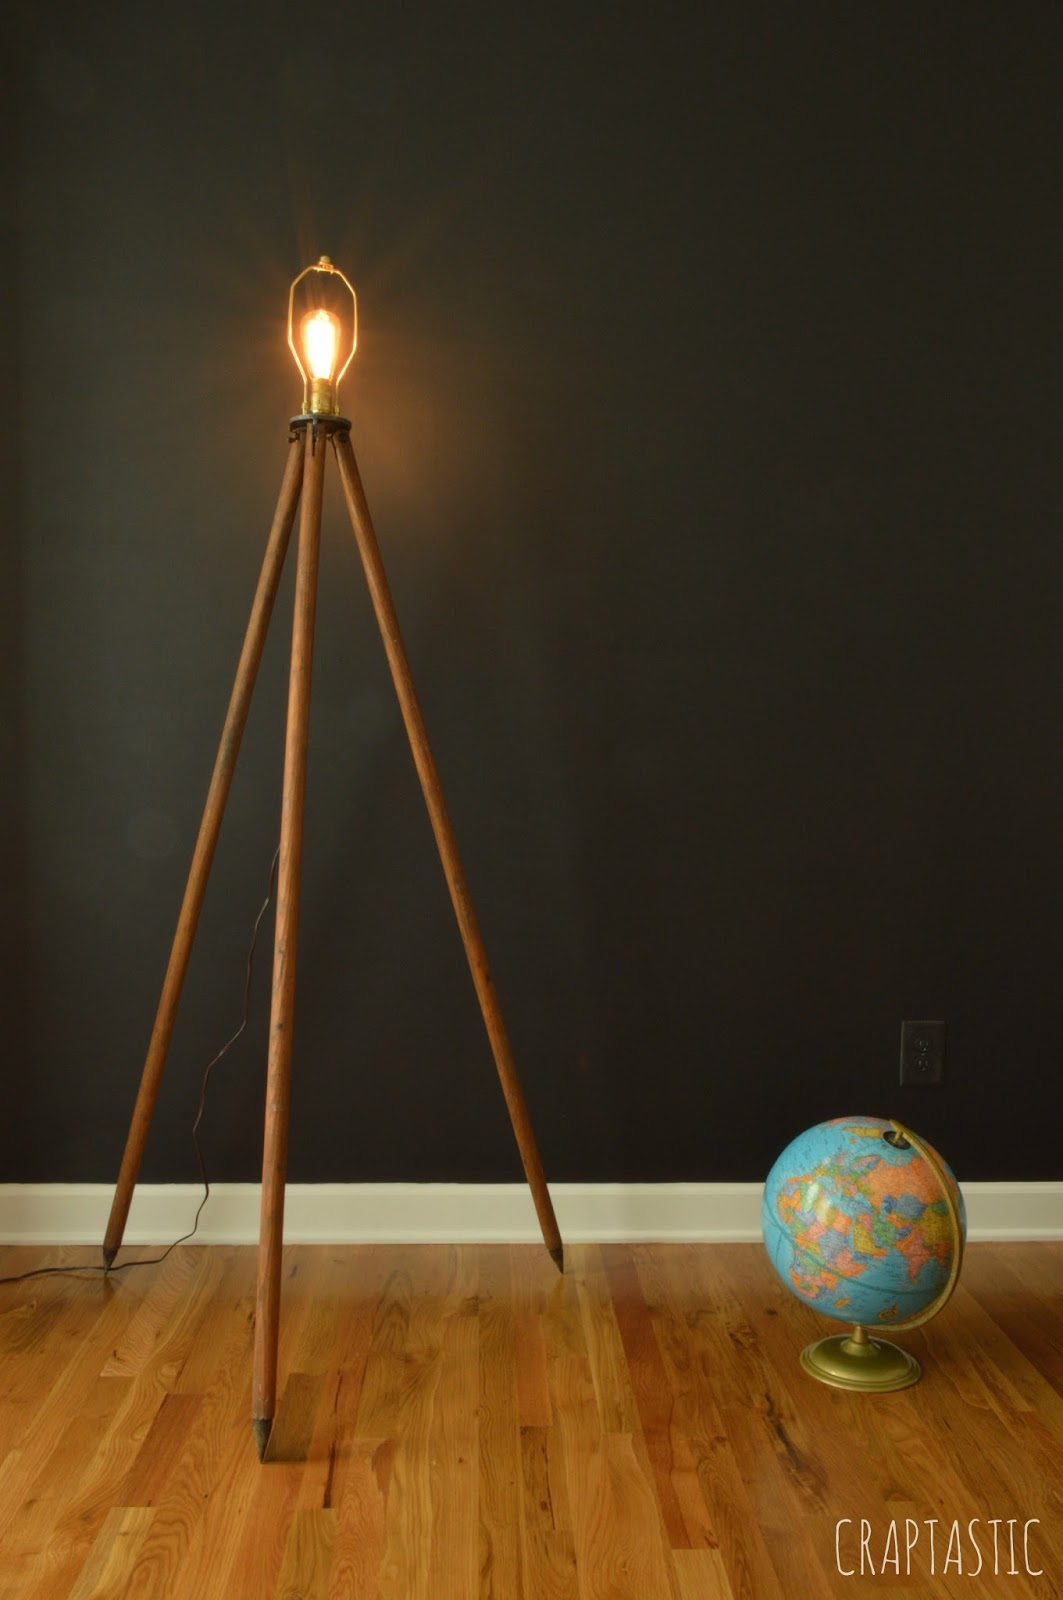 Craptastic Diy Tripod Lamp And Dining Room Update